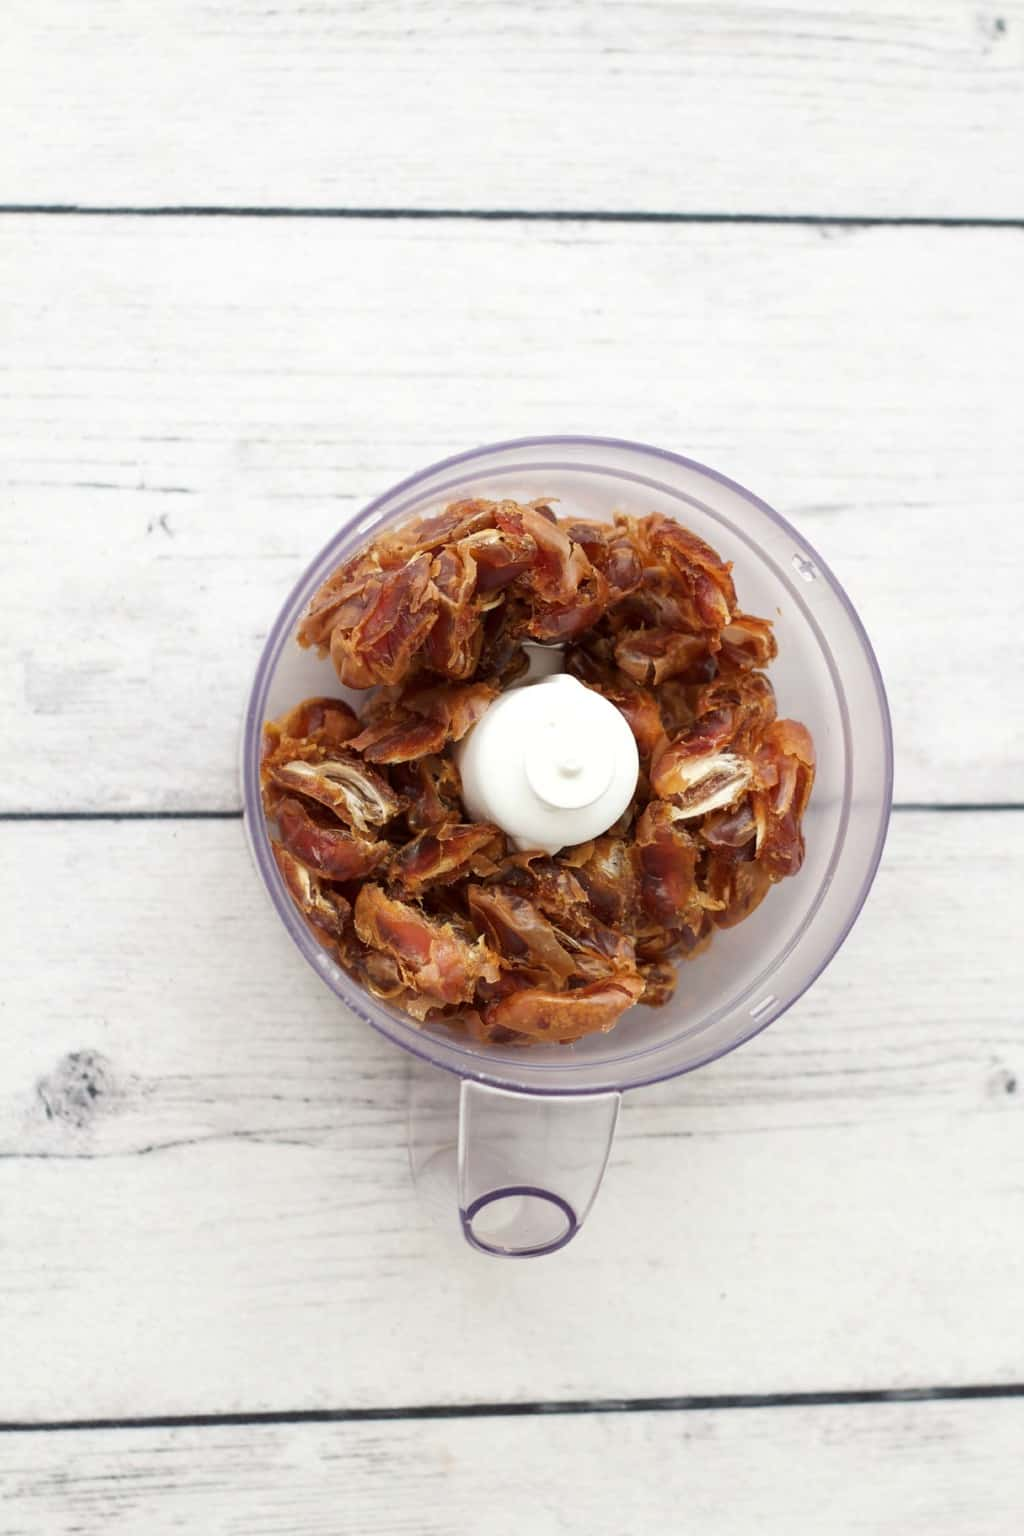 How to make date caramel #vegan #lovingitvegan #gluten-free #dairy-free